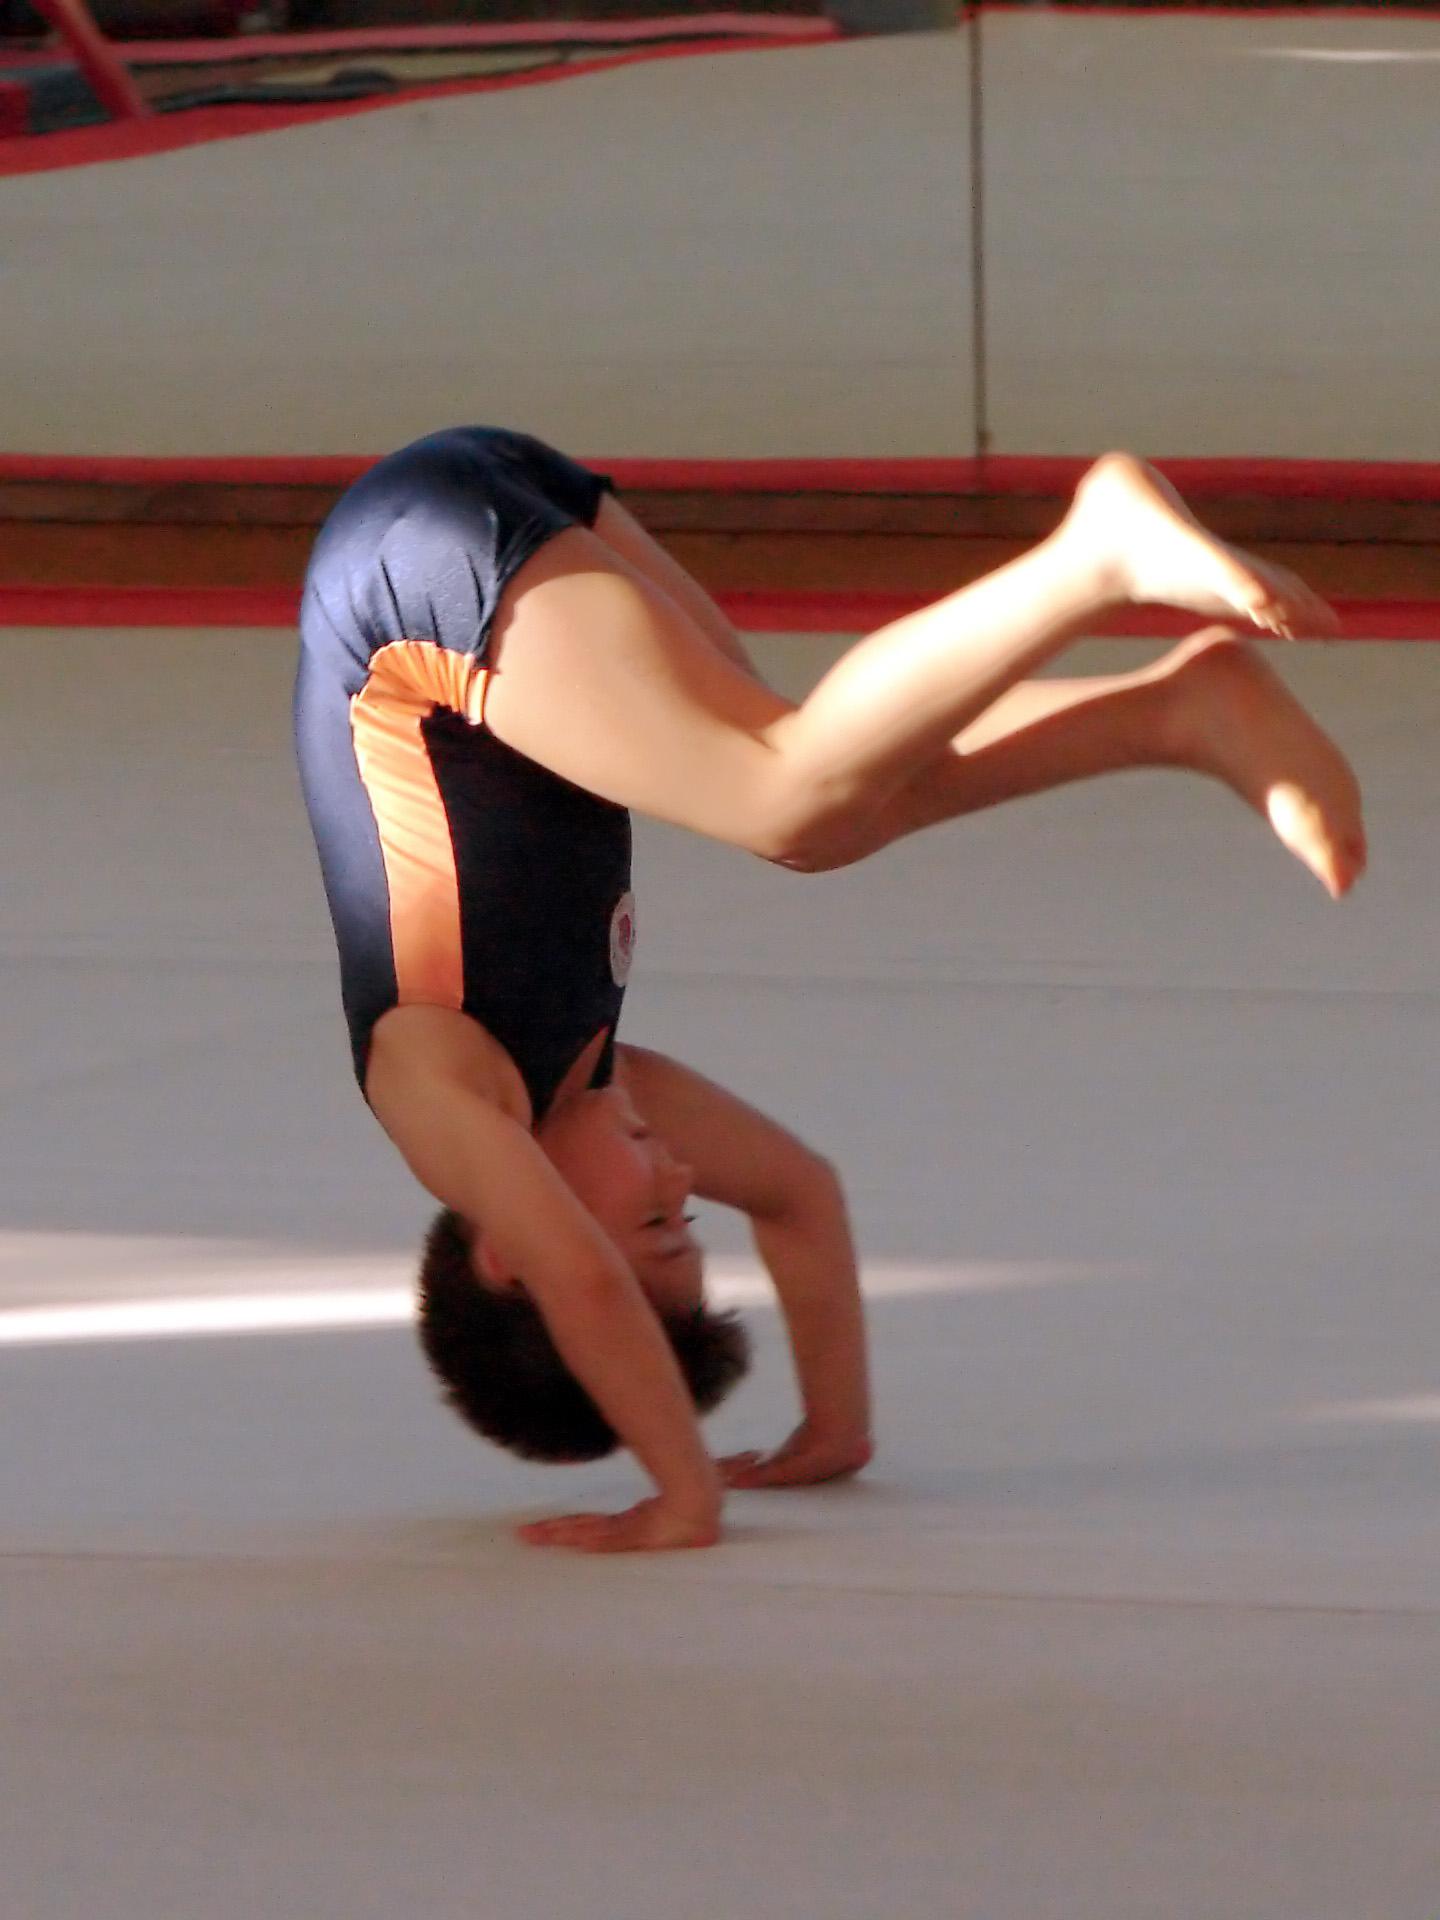 Image forward roll jpg gymnastics wiki - Image Forward Roll Jpg Gymnastics Wiki 0